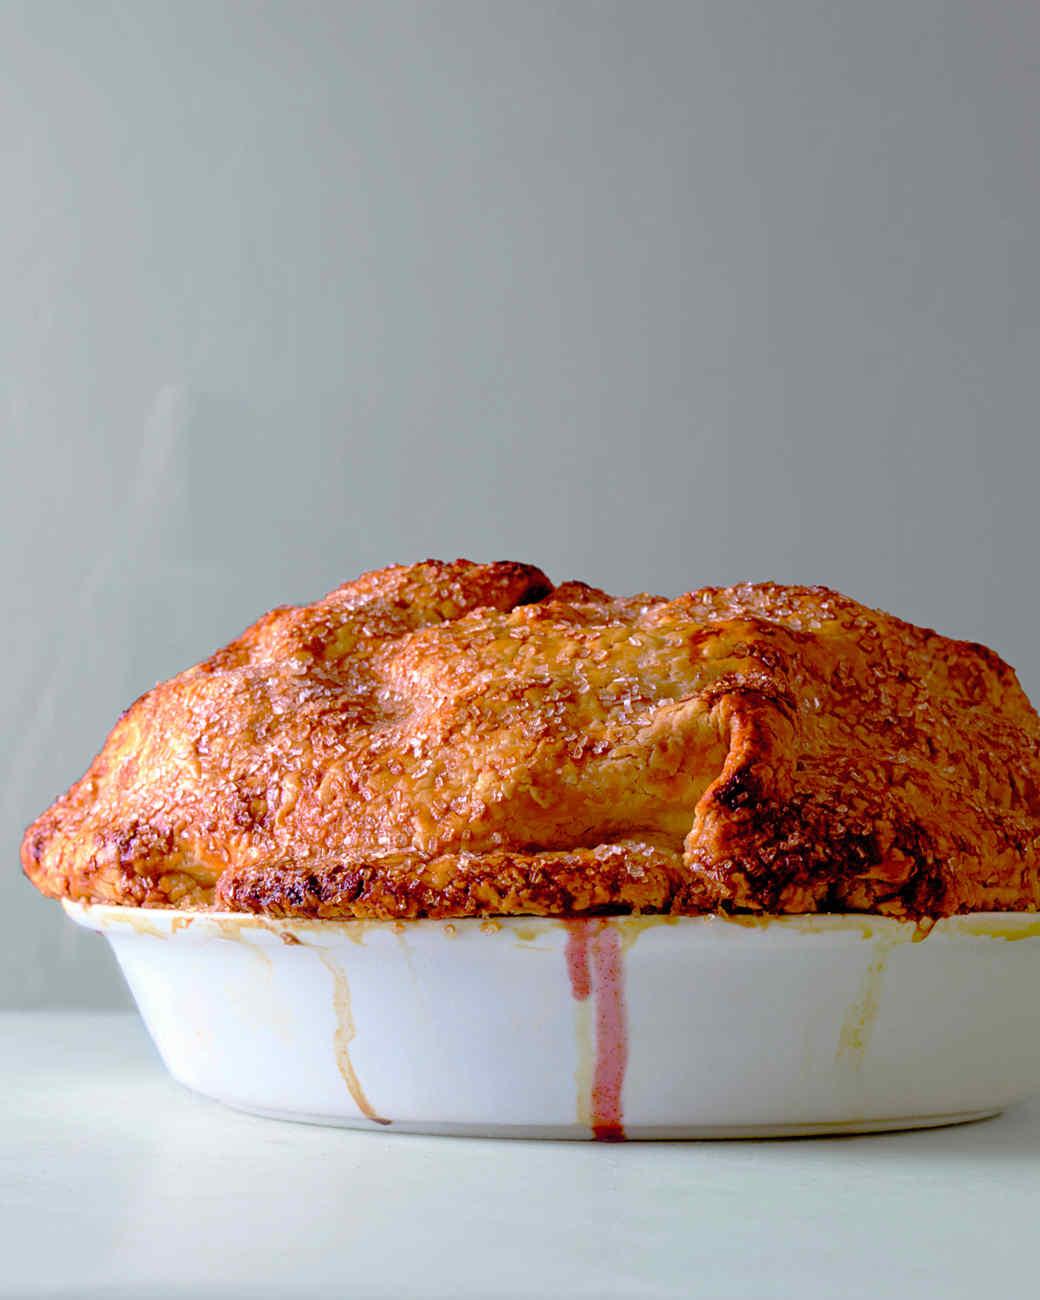 apple-cranberry-pie-mld107719.jpg